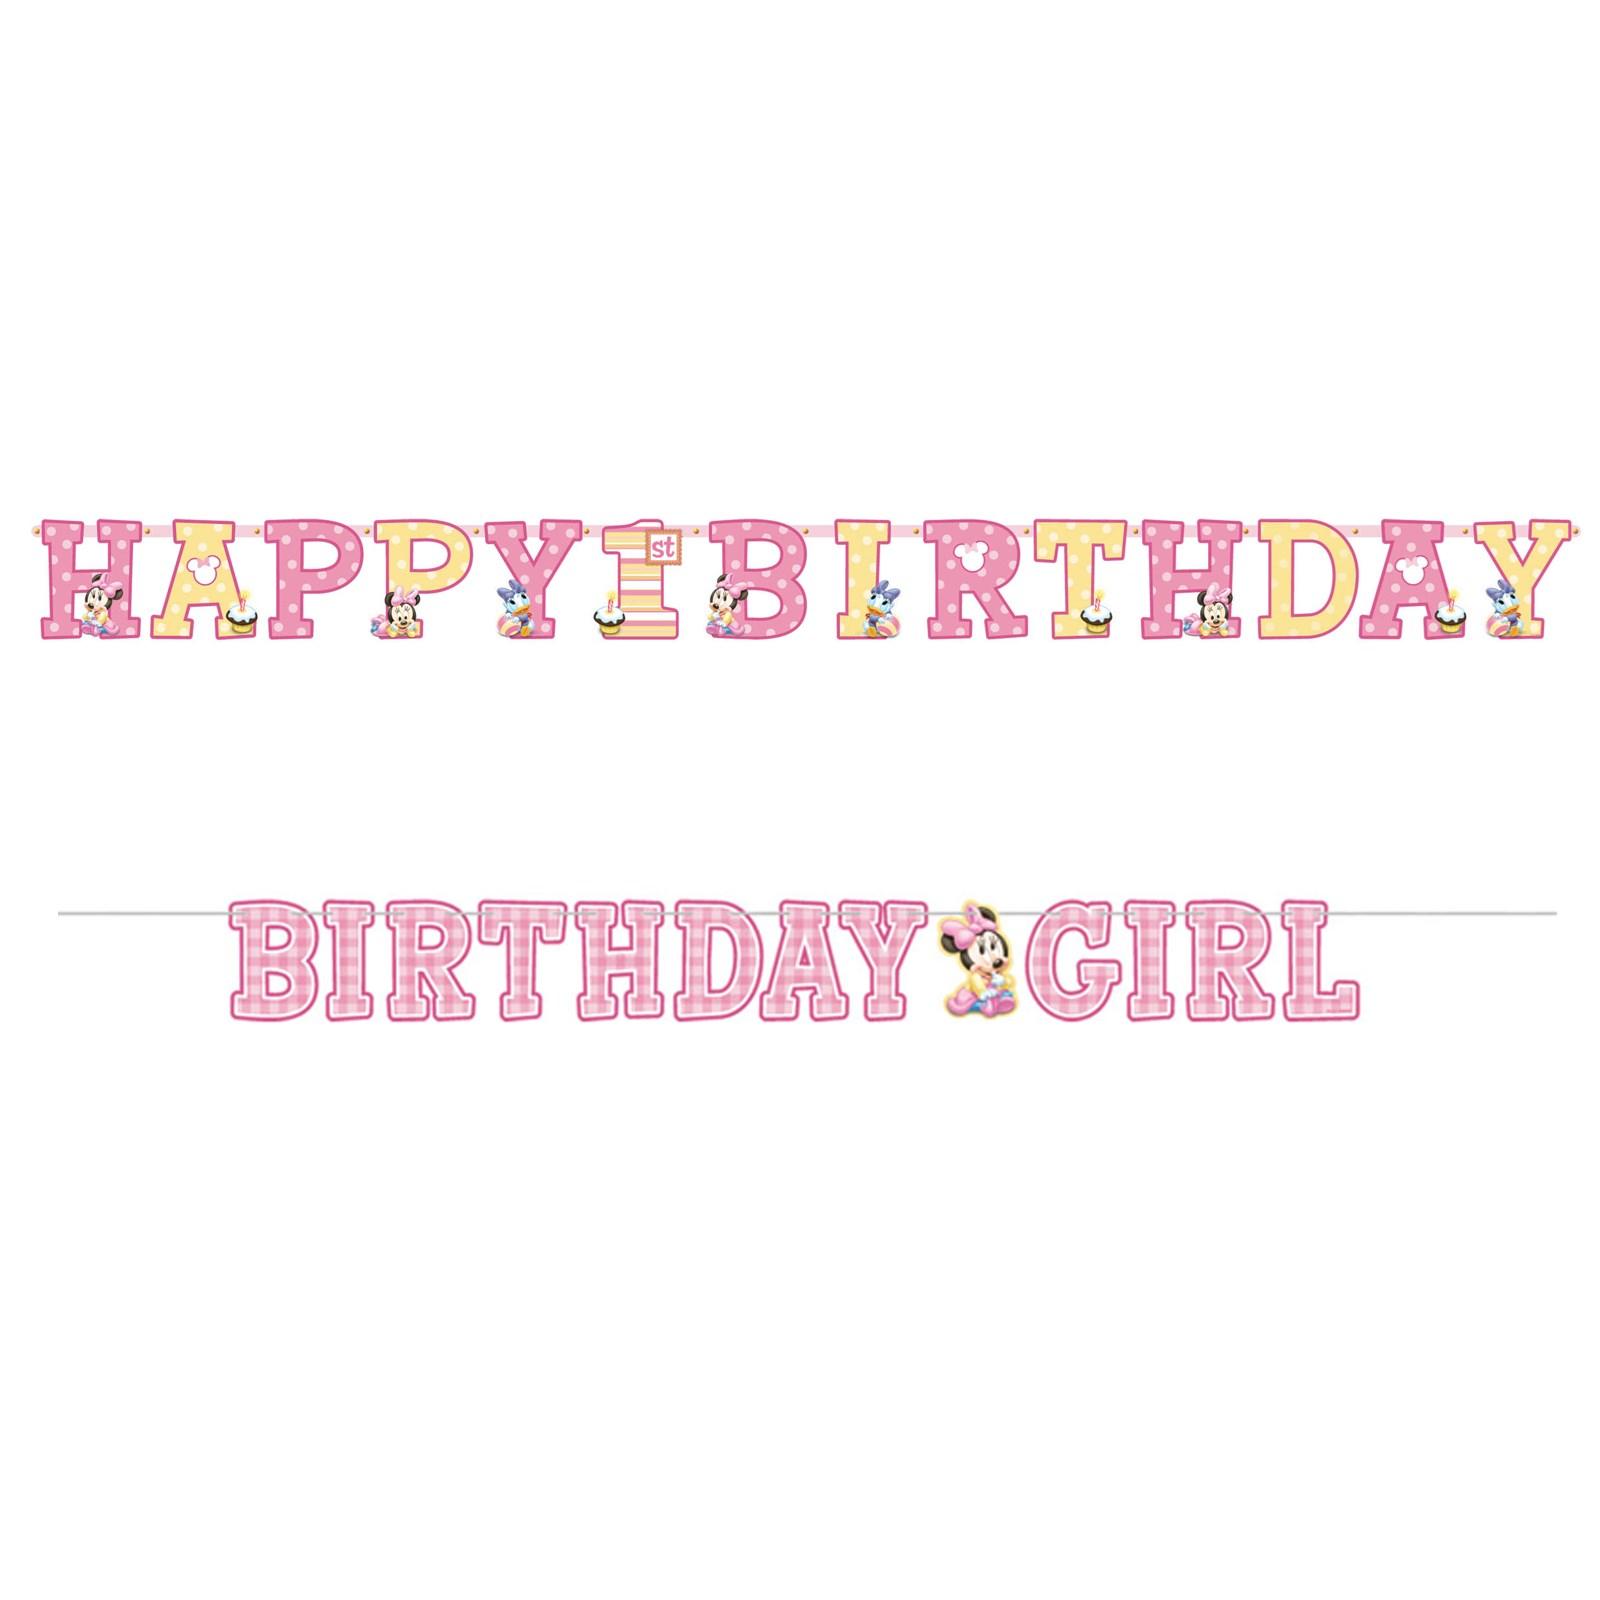 Disney Minnie 1st Birthday Jumbo Letter Banner Combo Pack kids birthday partyware